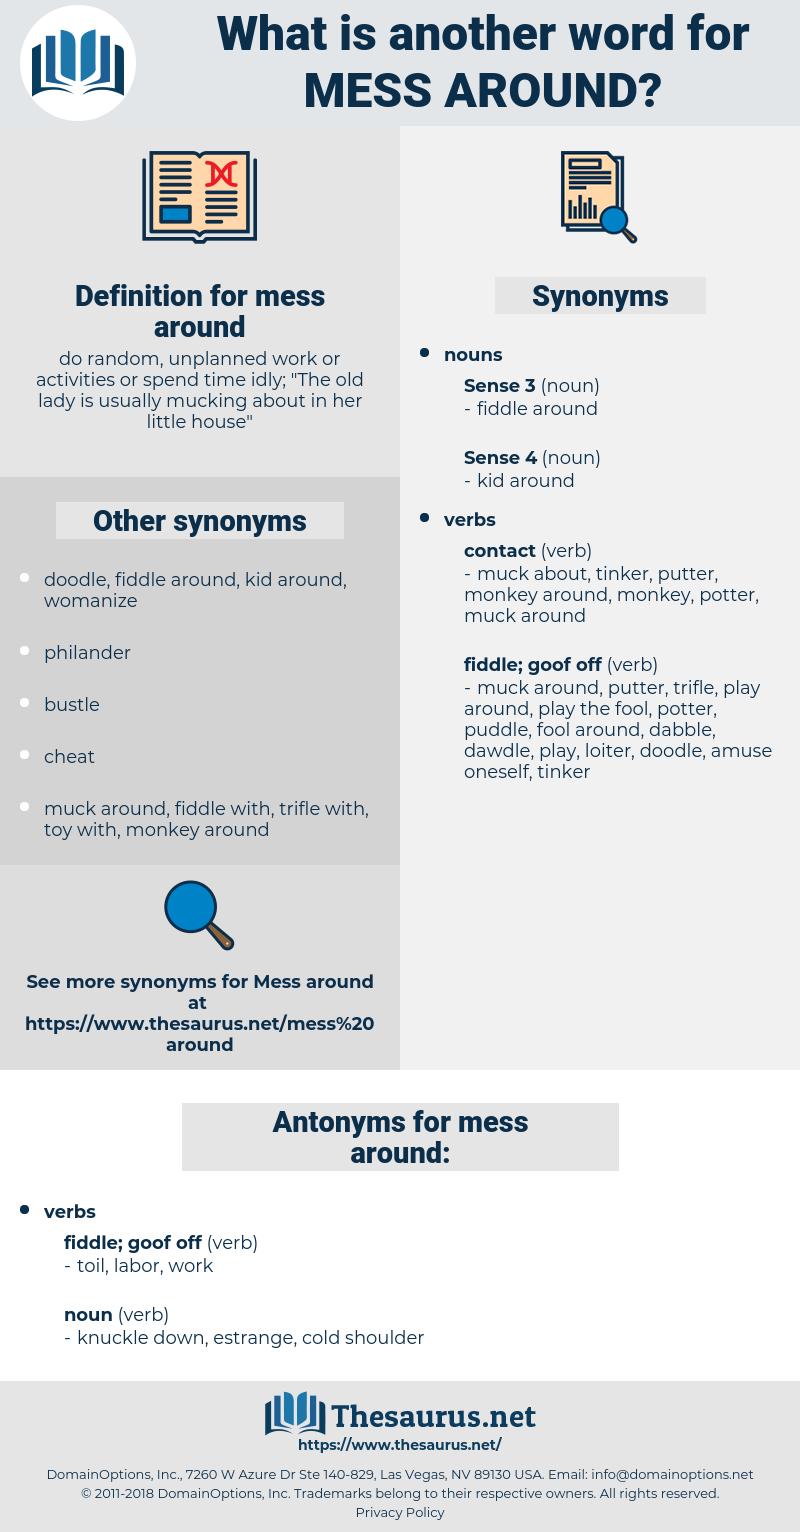 mess around, synonym mess around, another word for mess around, words like mess around, thesaurus mess around